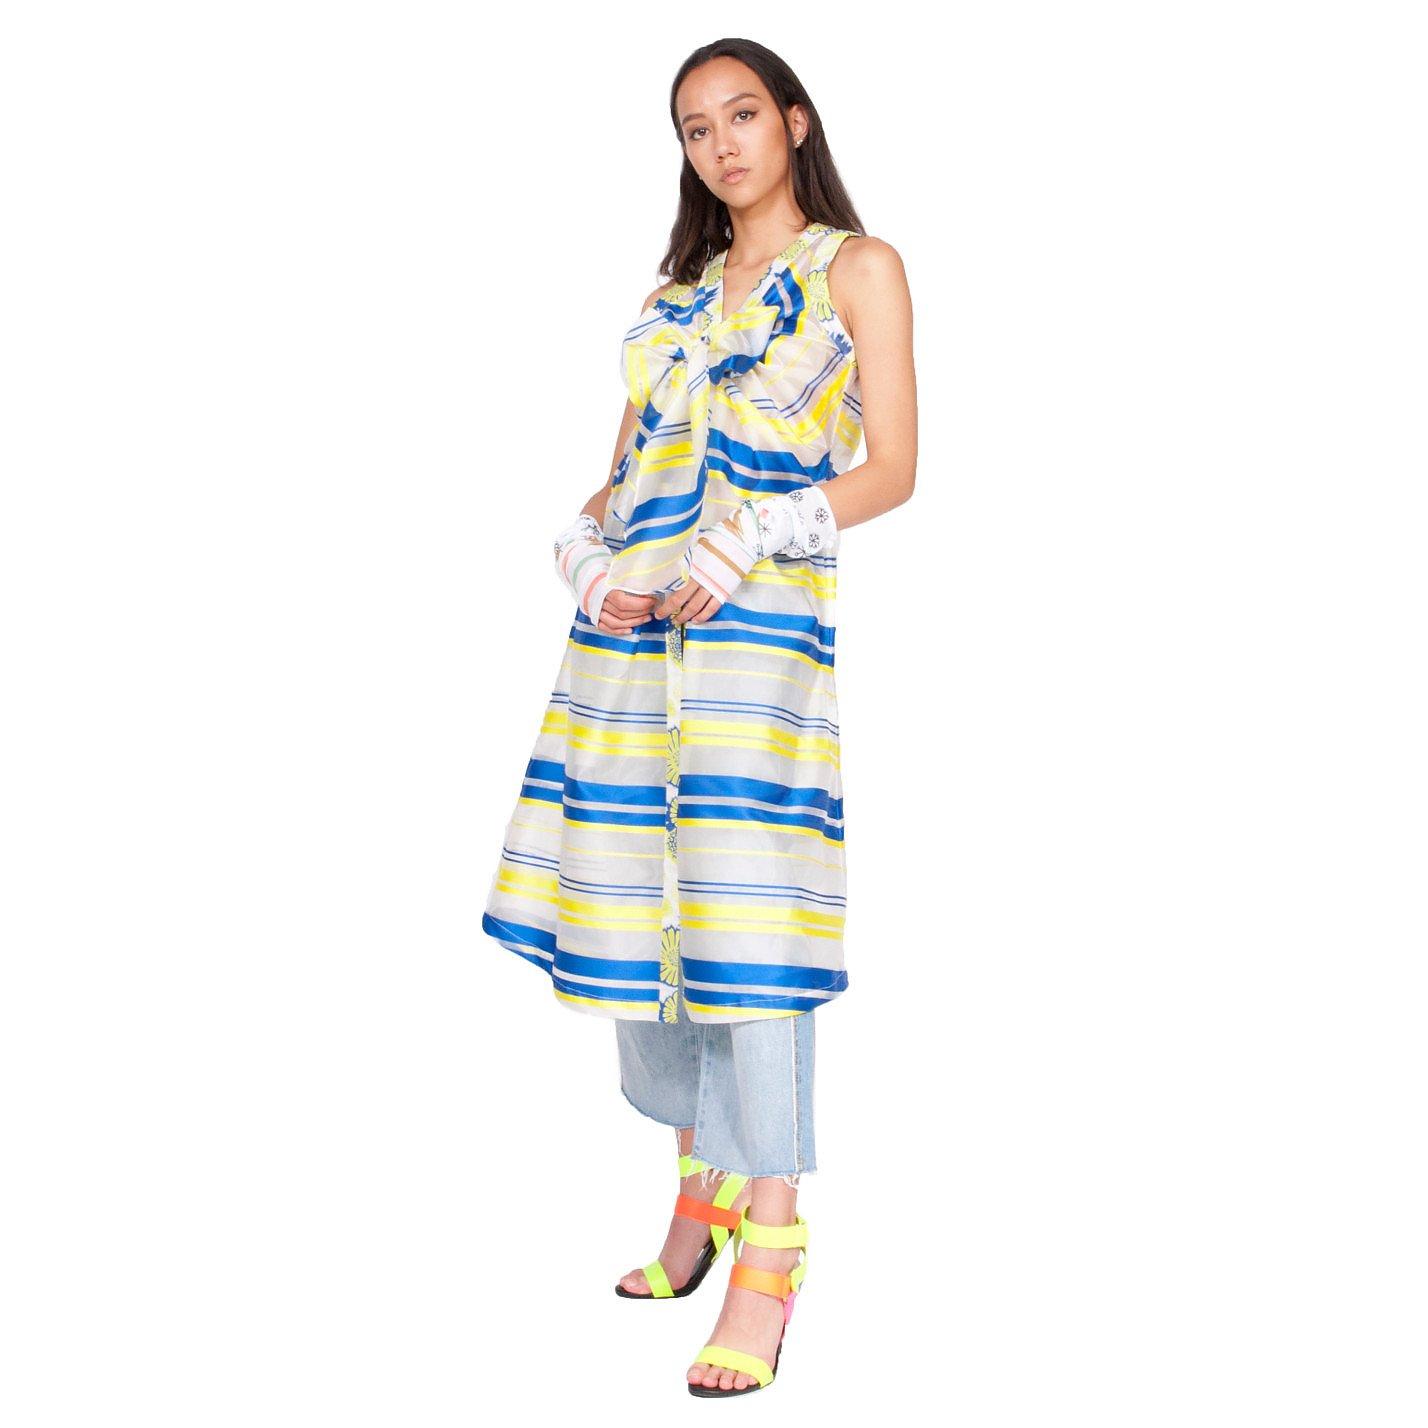 Syra J Striped Organza Dress With Bow